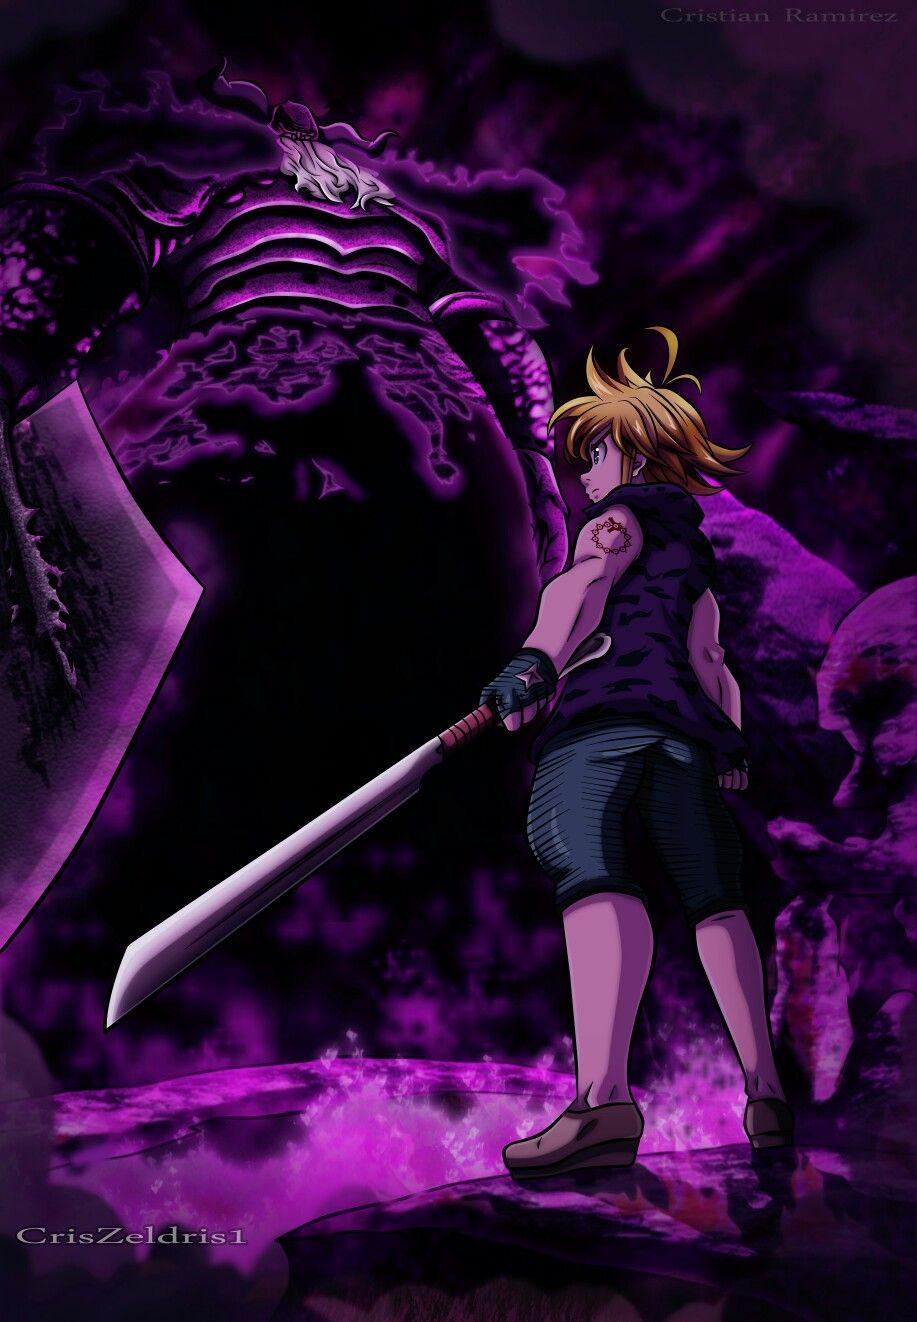 Meliodas Demon King Demon King Anime Seven Deadly Sins Seven Deadly Sins Anime